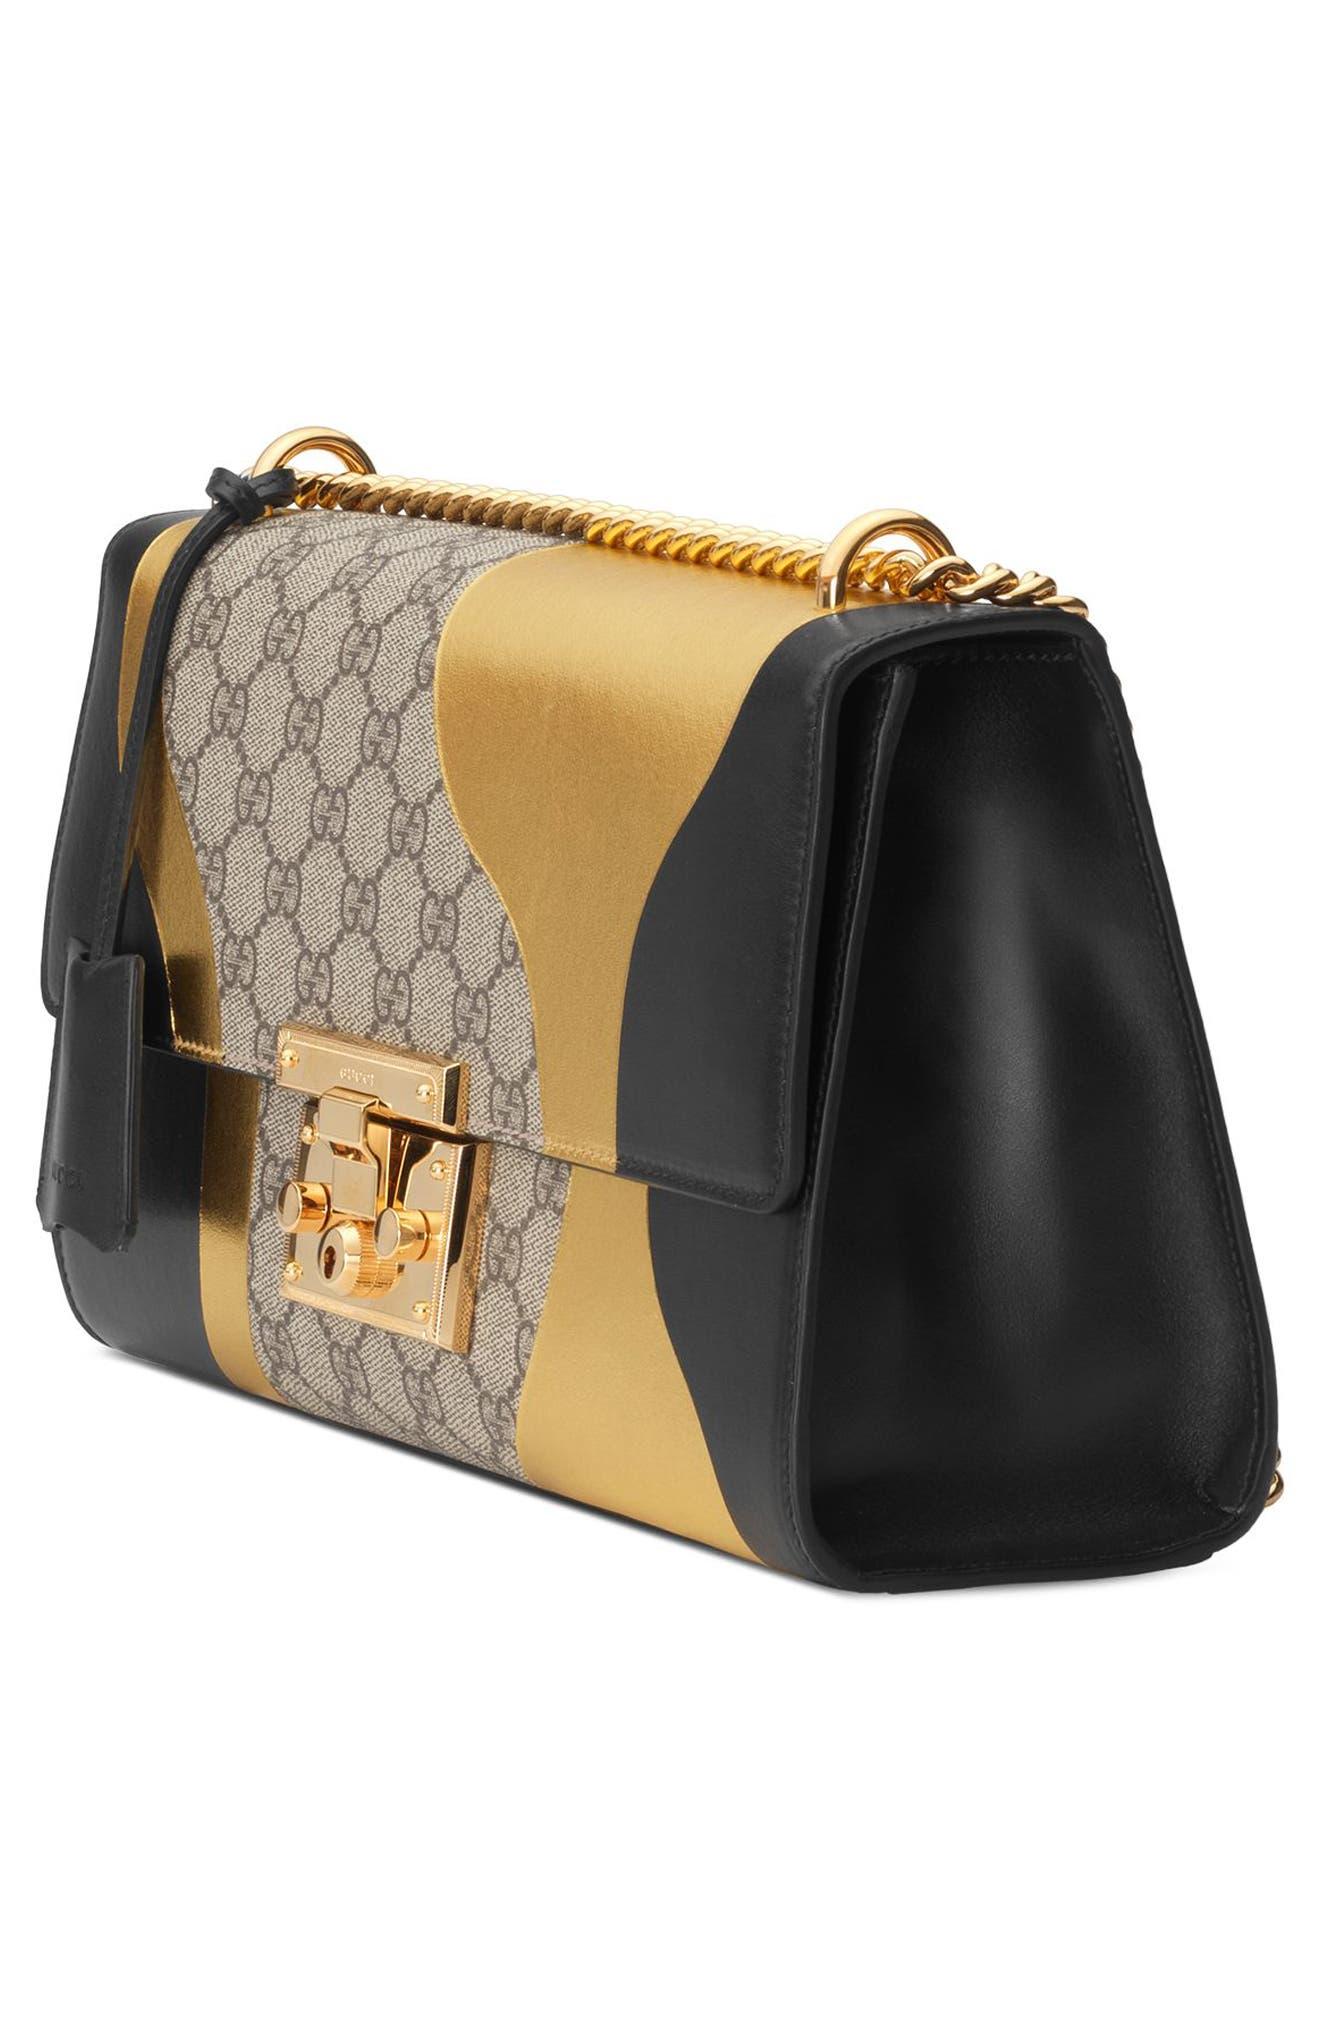 Medium Padlock GG Supreme Canvas & Leather Shoulder Bag,                             Alternate thumbnail 4, color,                             NERO/ORO VECCHIO